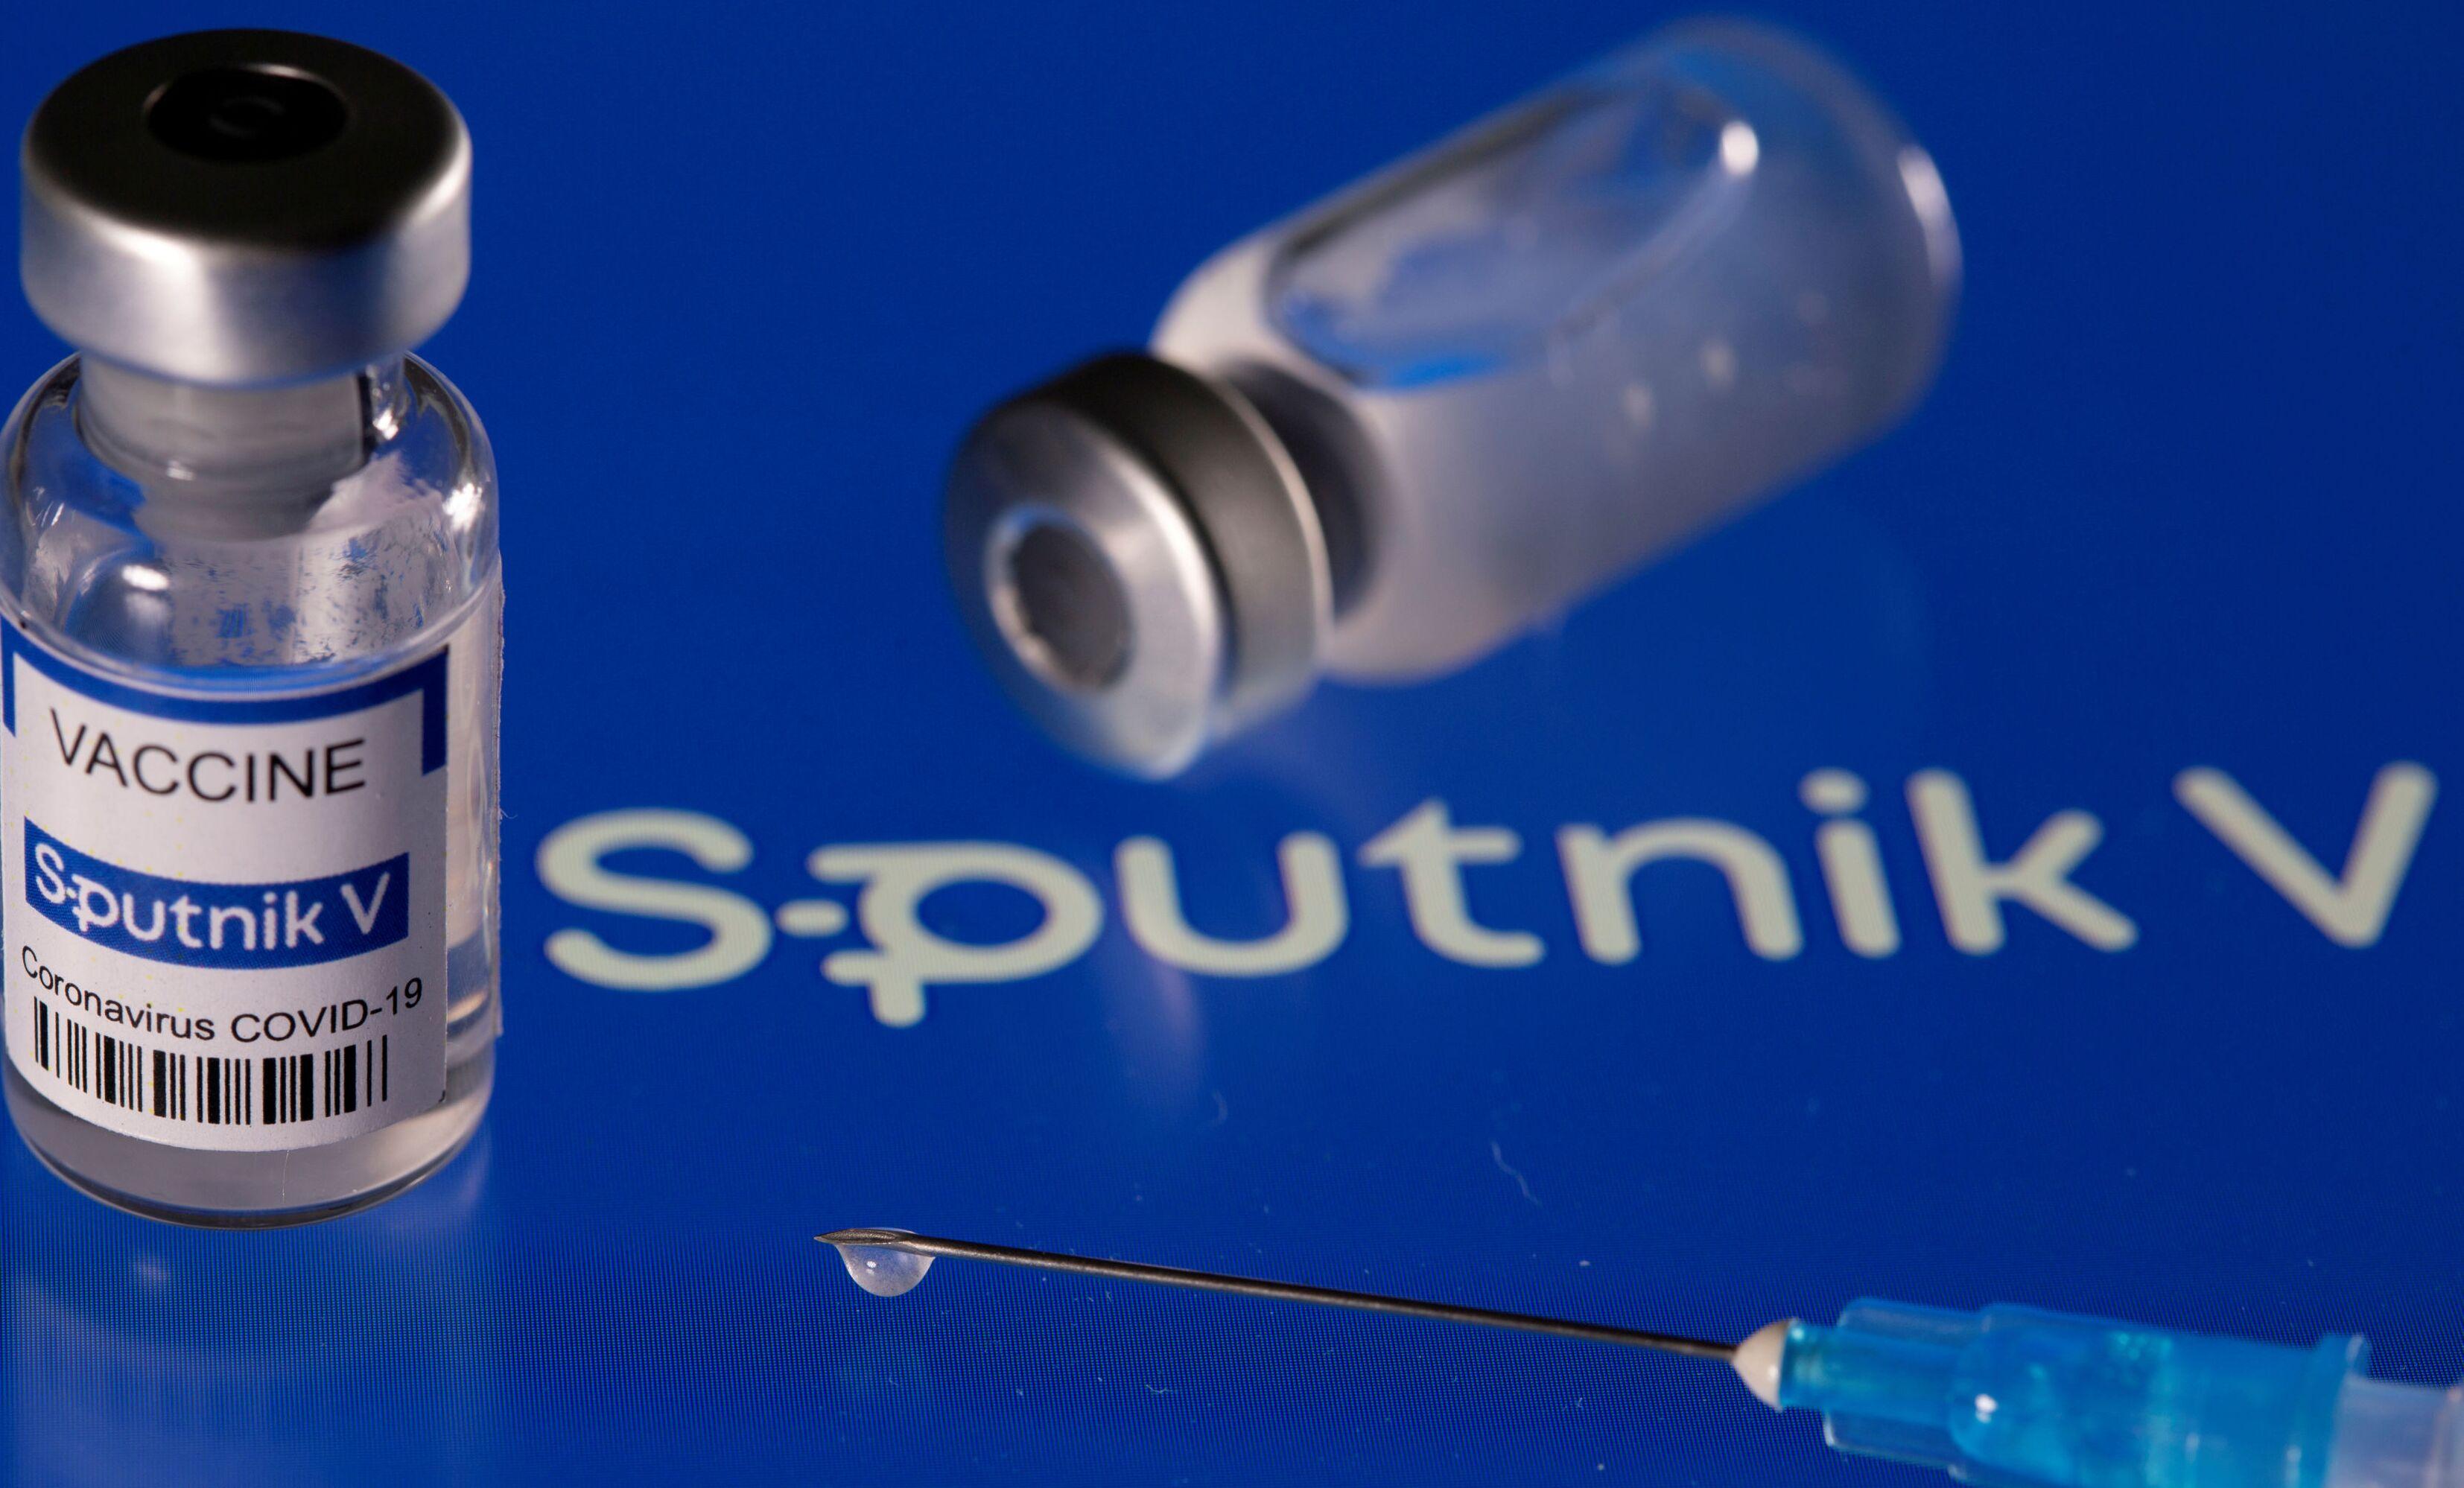 Vial labelled Sputnik V coronavirus disease (COVID-19) vaccine placed on displayed Sputnik V logo is seen in this illustration picture taken March 24, 2021.